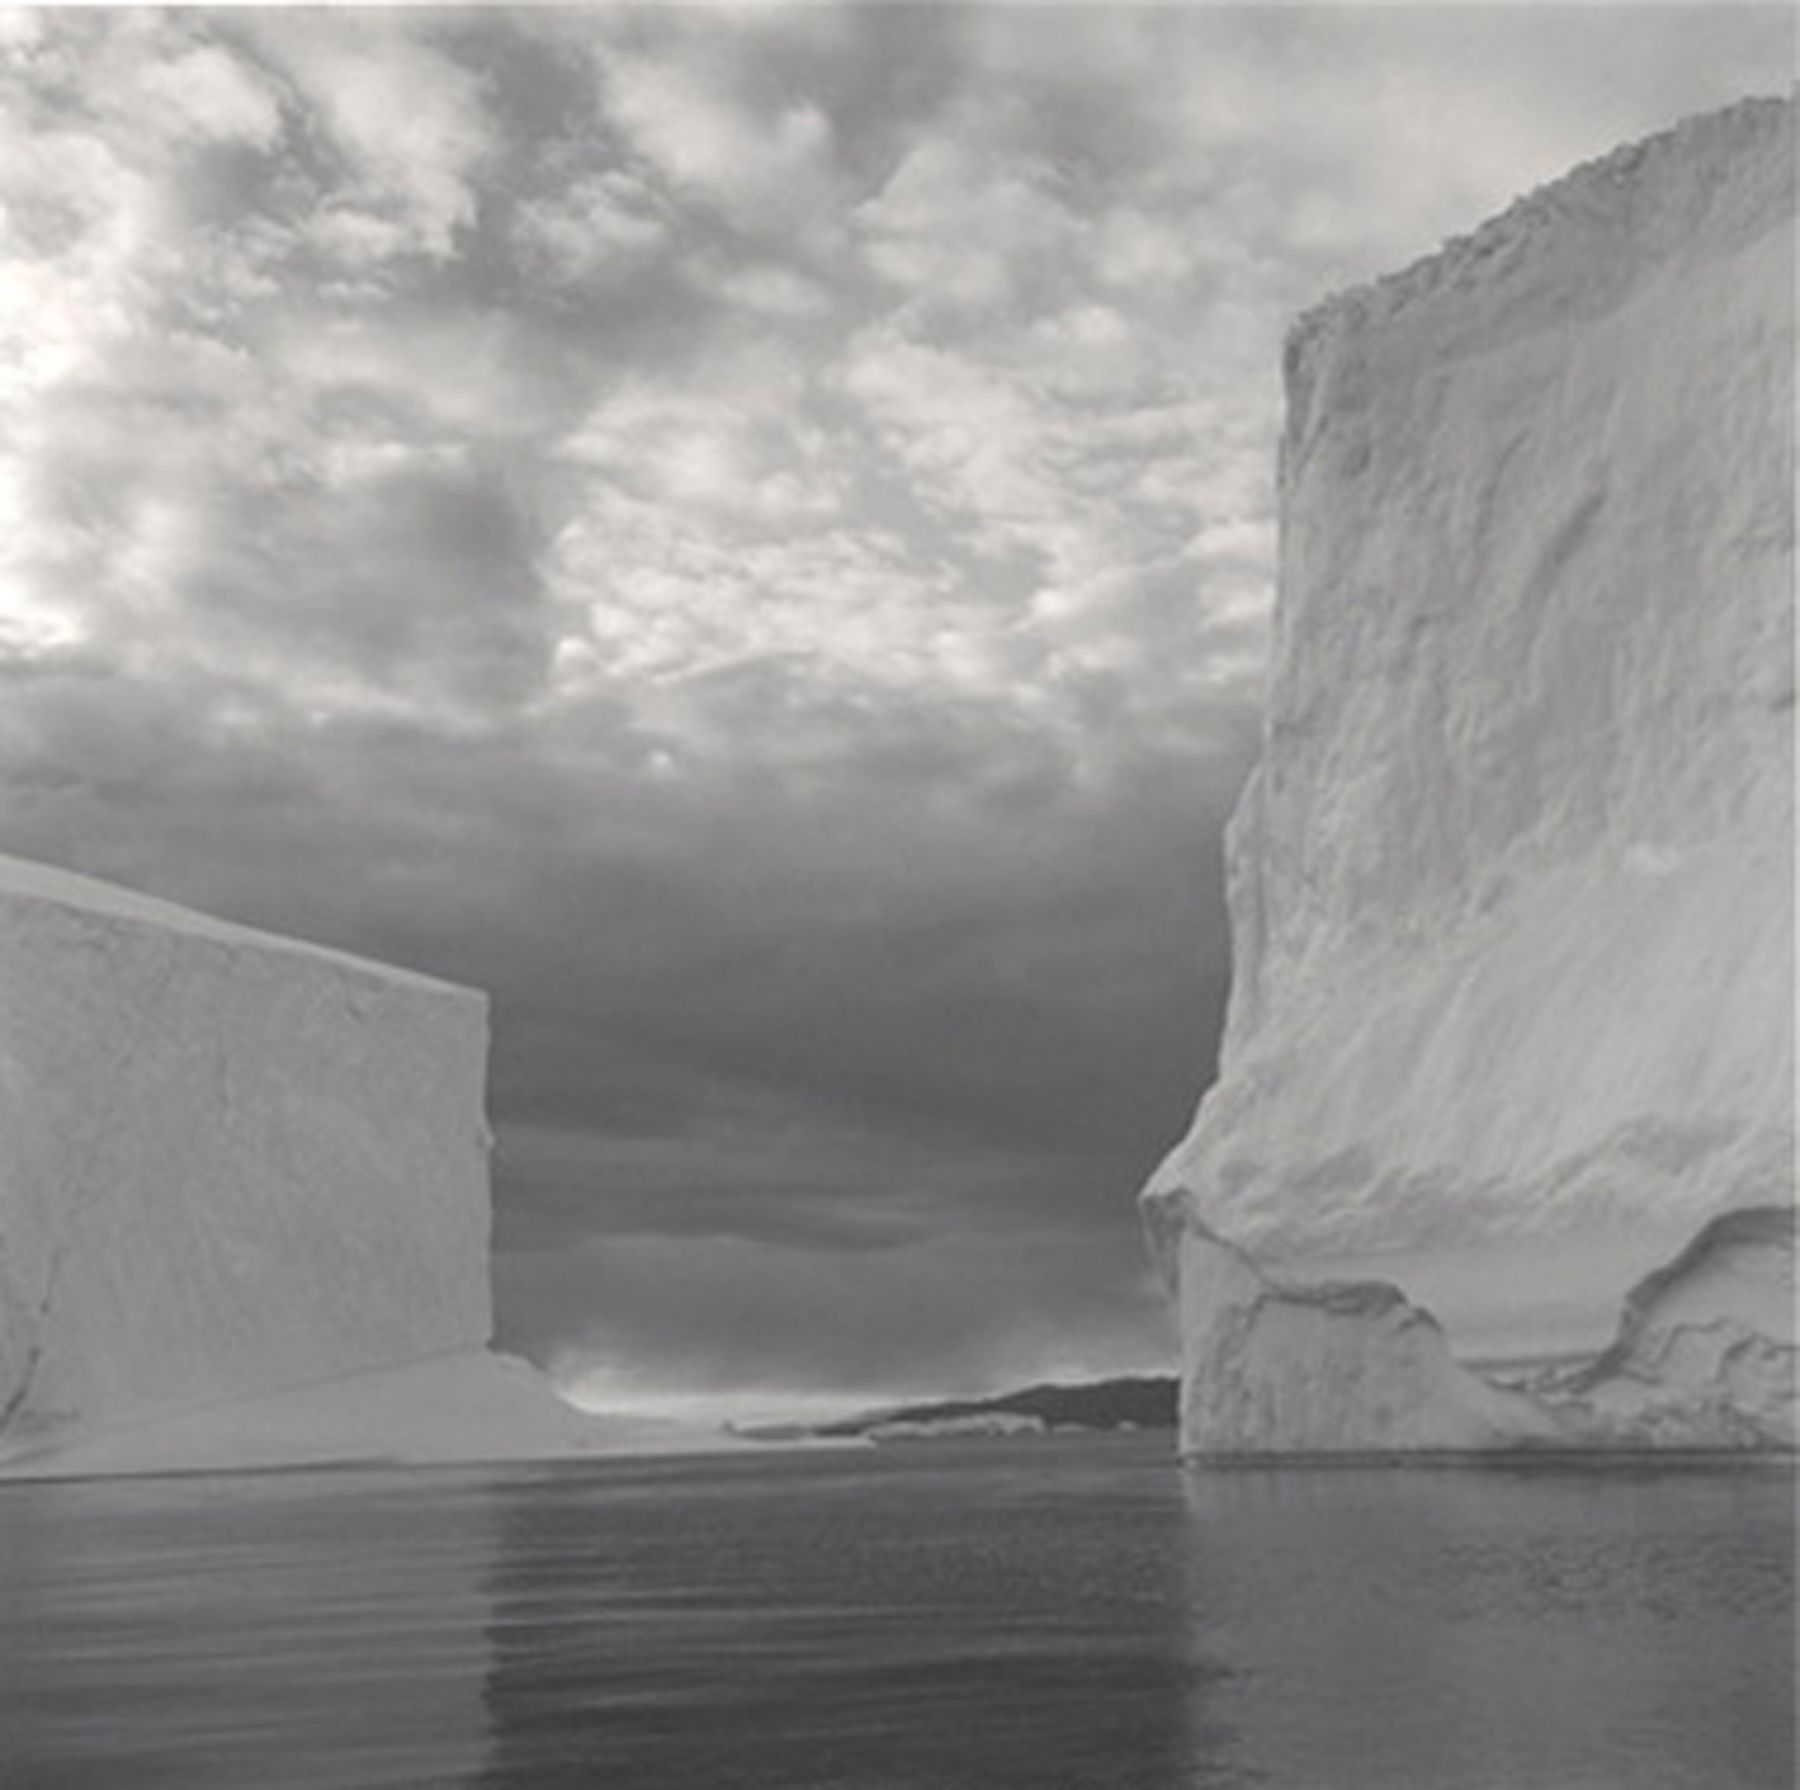 Lynn Davis Iceberg 23, Disko Bay, Greenland, 2000